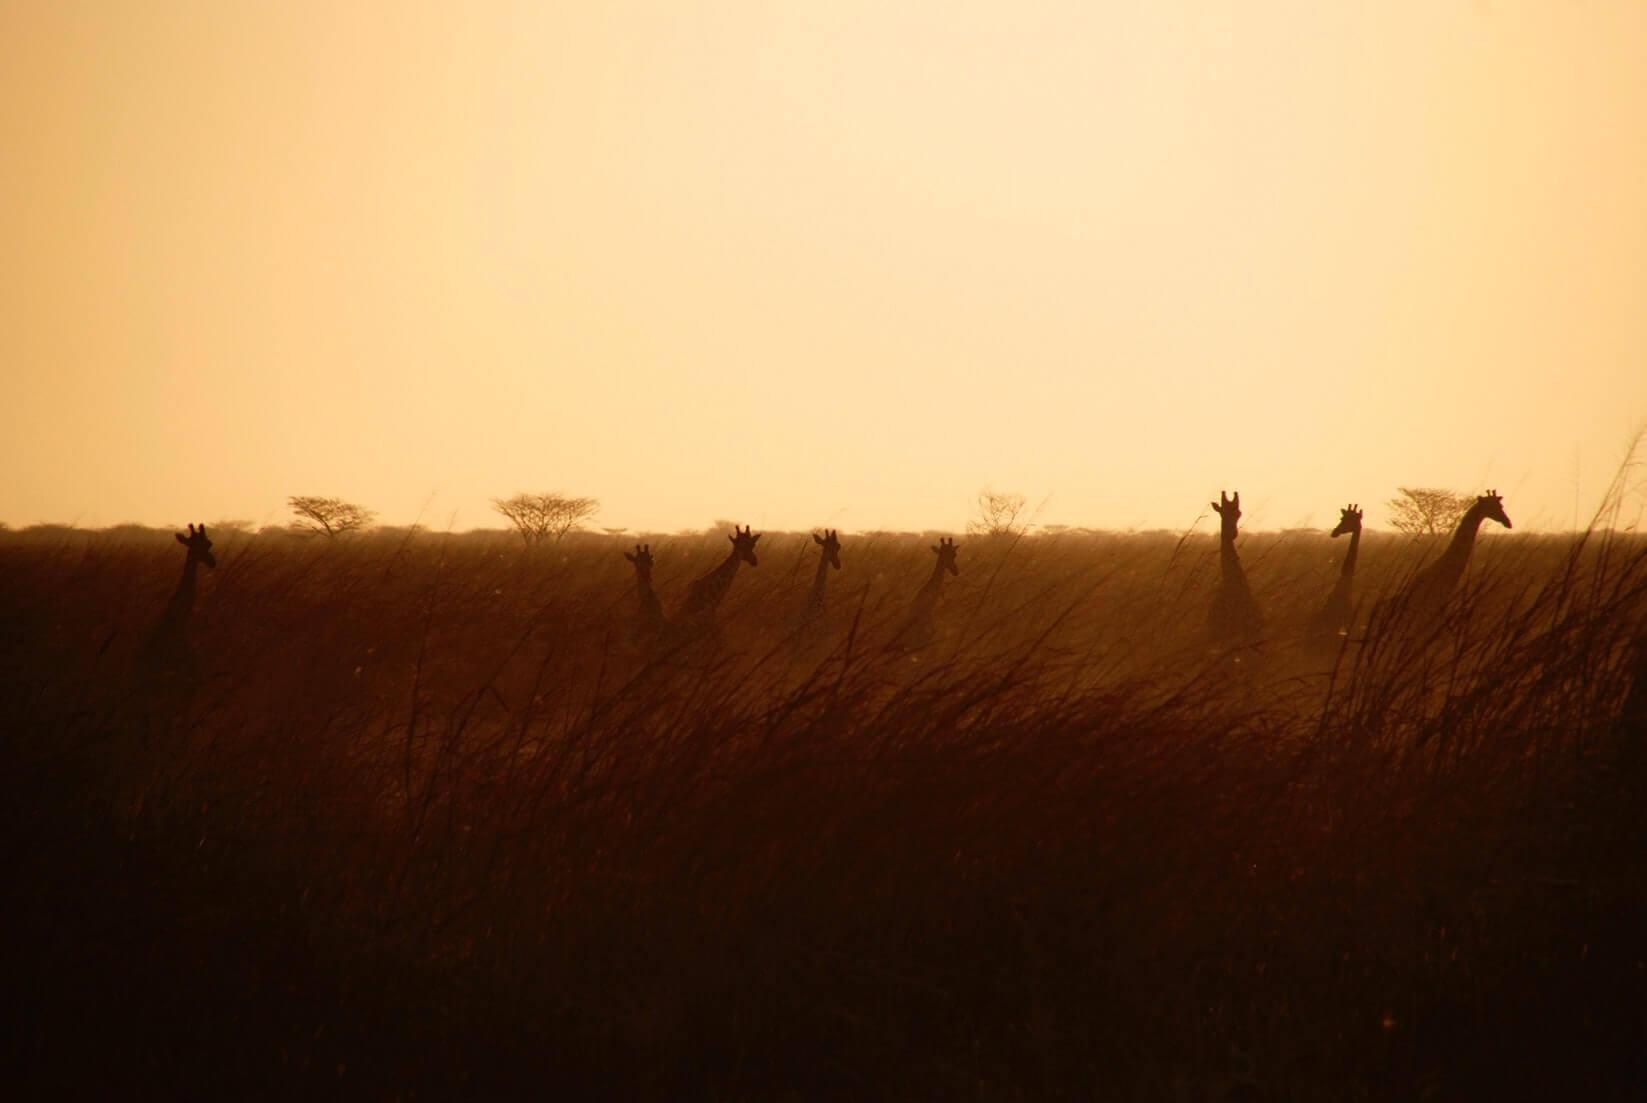 Африка от Найроби до Кейптауна: как мы за полтора месяца пересекли континент